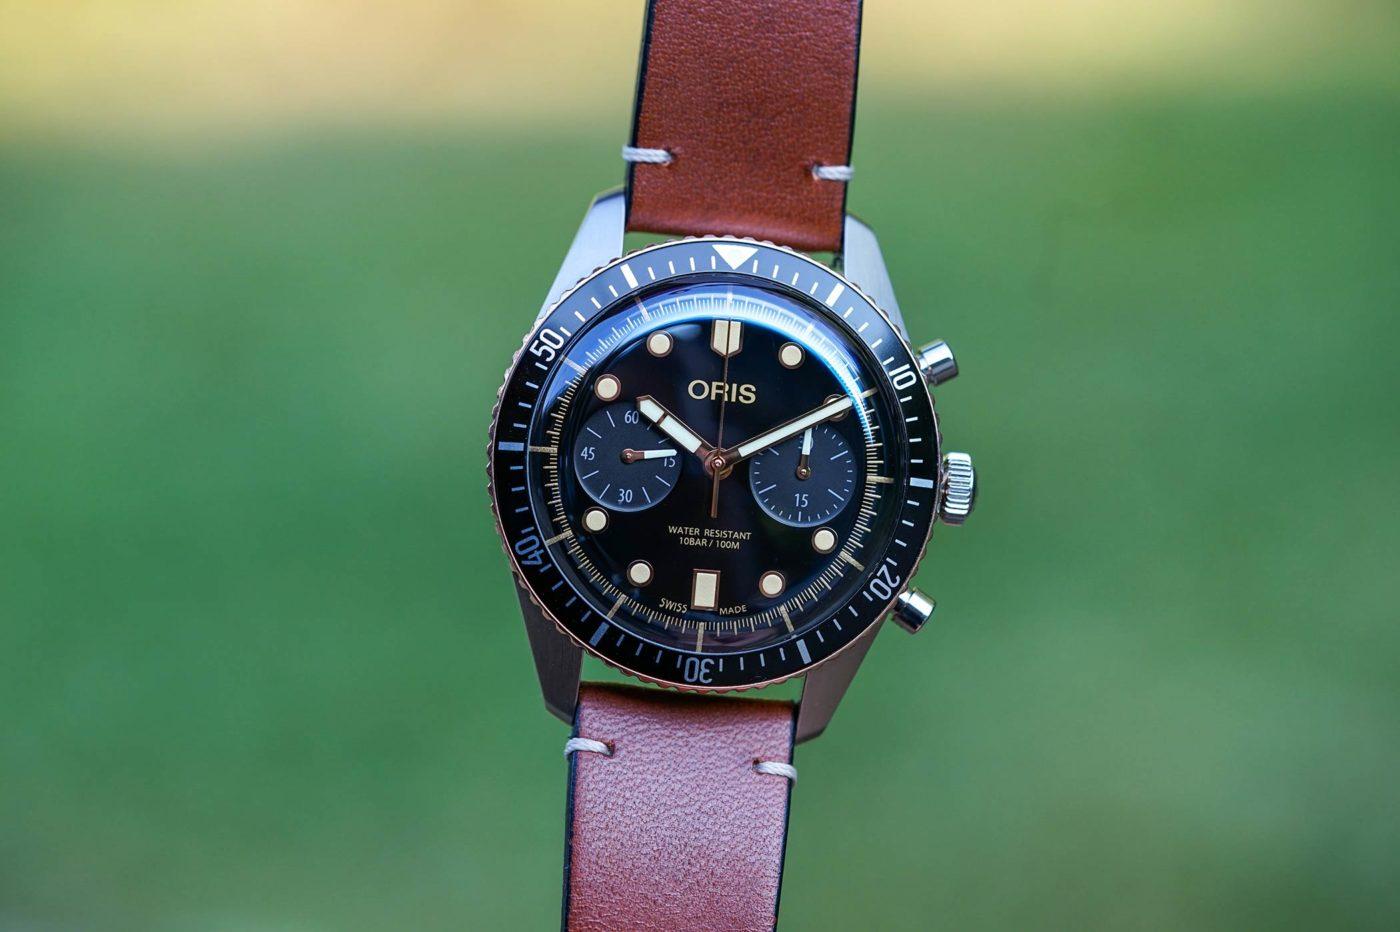 Recenzja Oris Divers Sixty-Five Chronograph [zdjęcia live, cena]